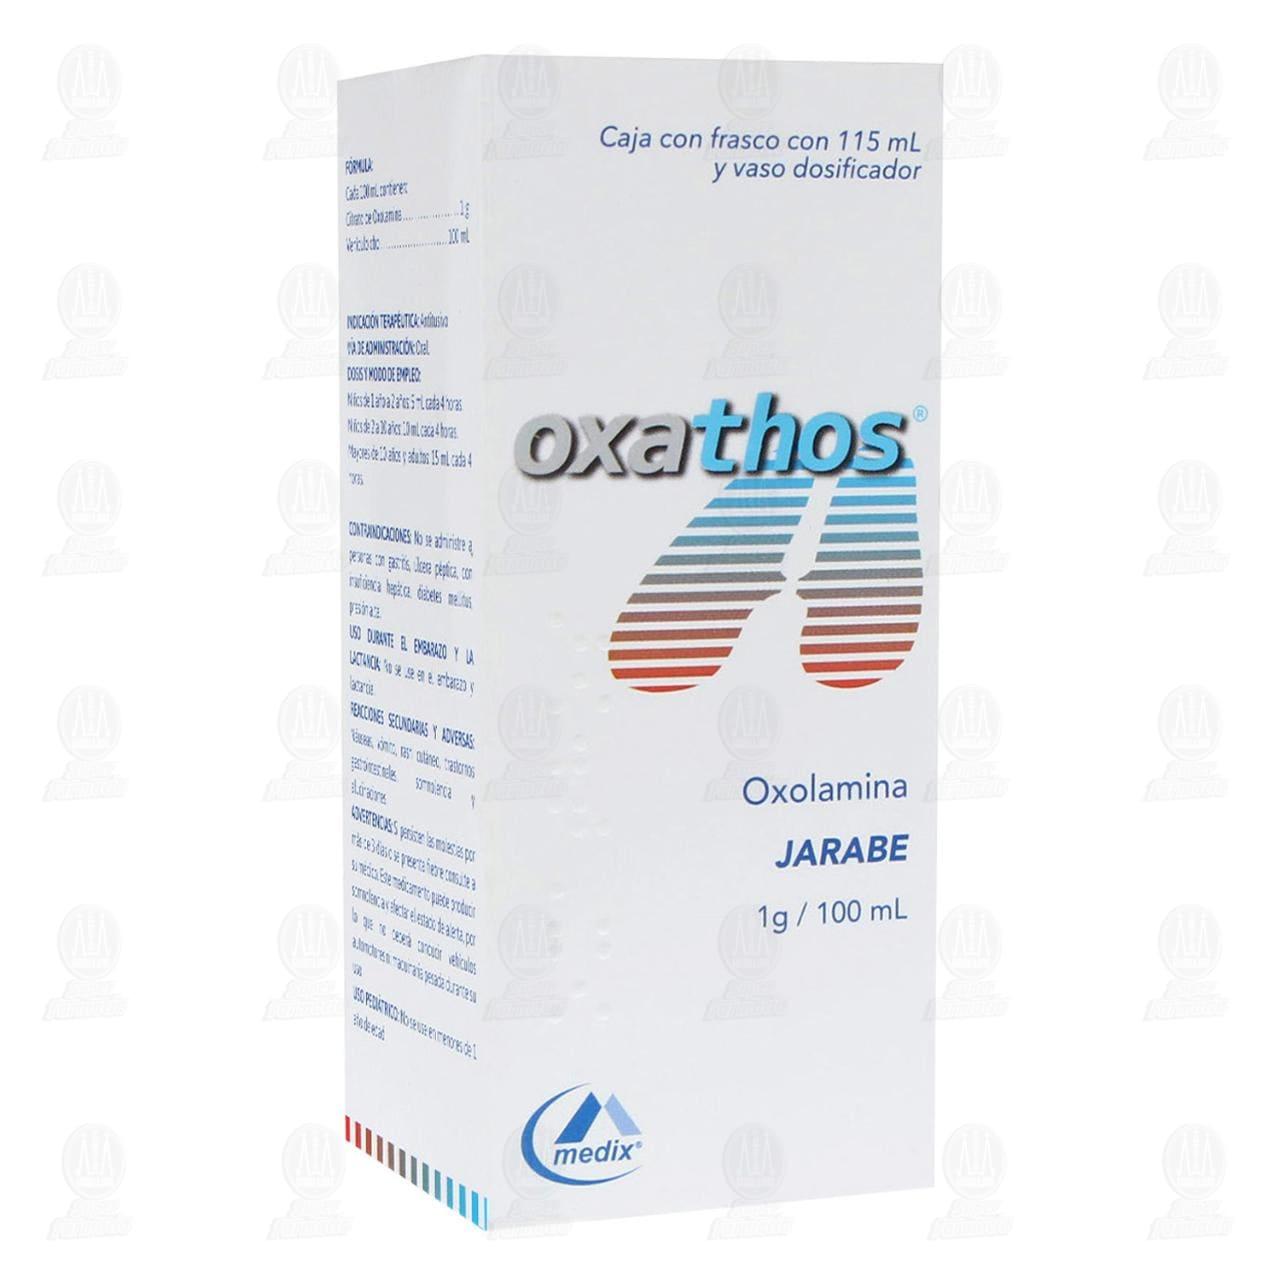 Comprar Oxathos Jarabe 1gr/100ml 115ml en Farmacias Guadalajara